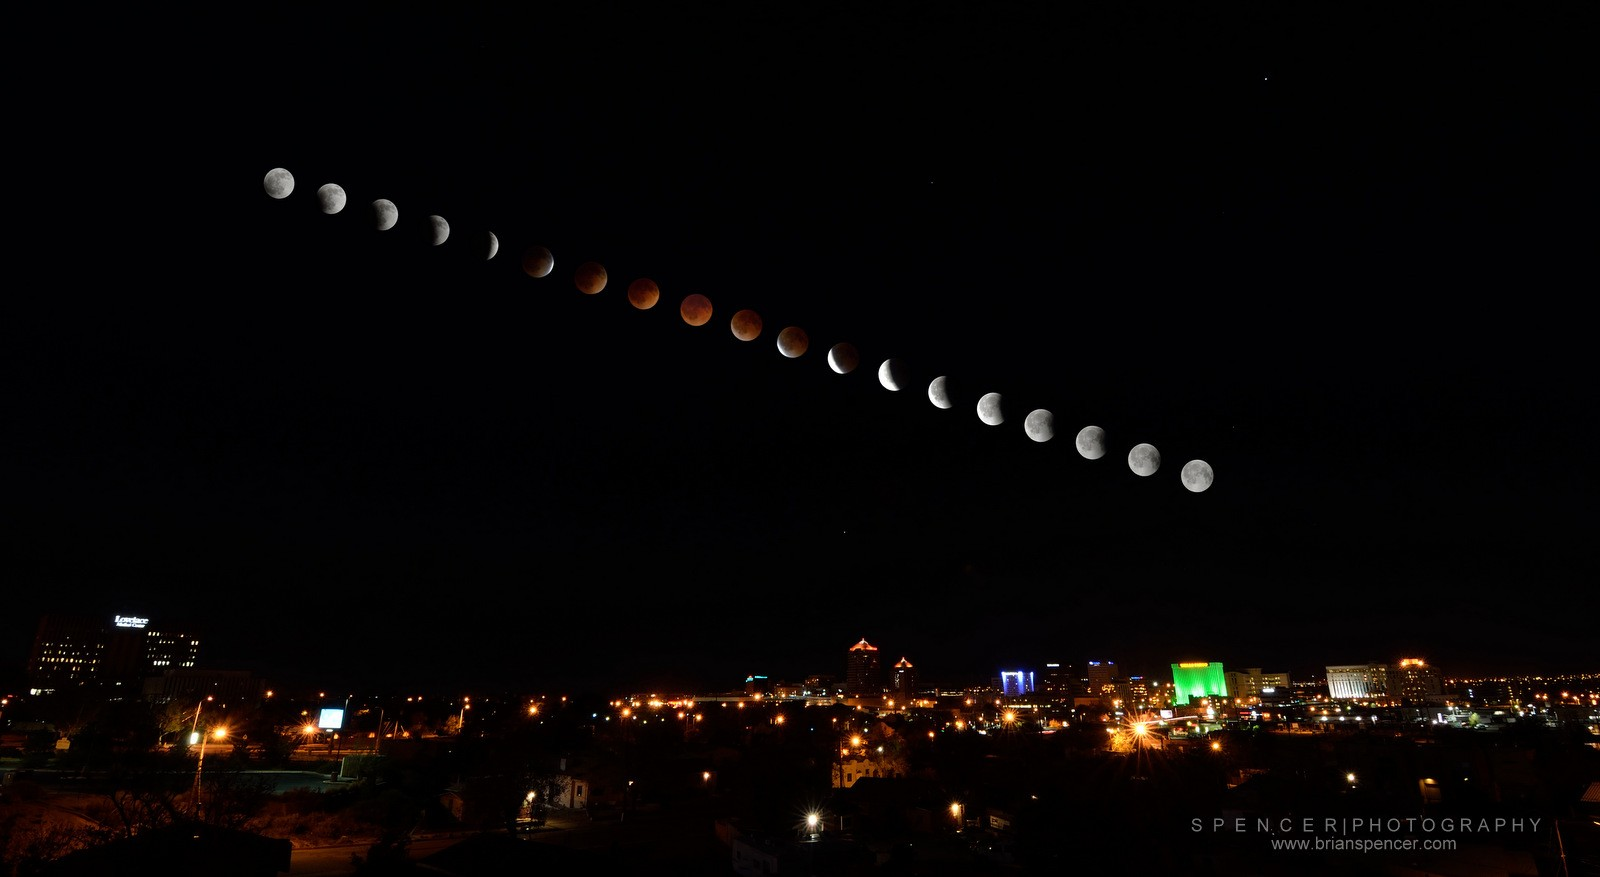 Moon Phases Night City 1600x877